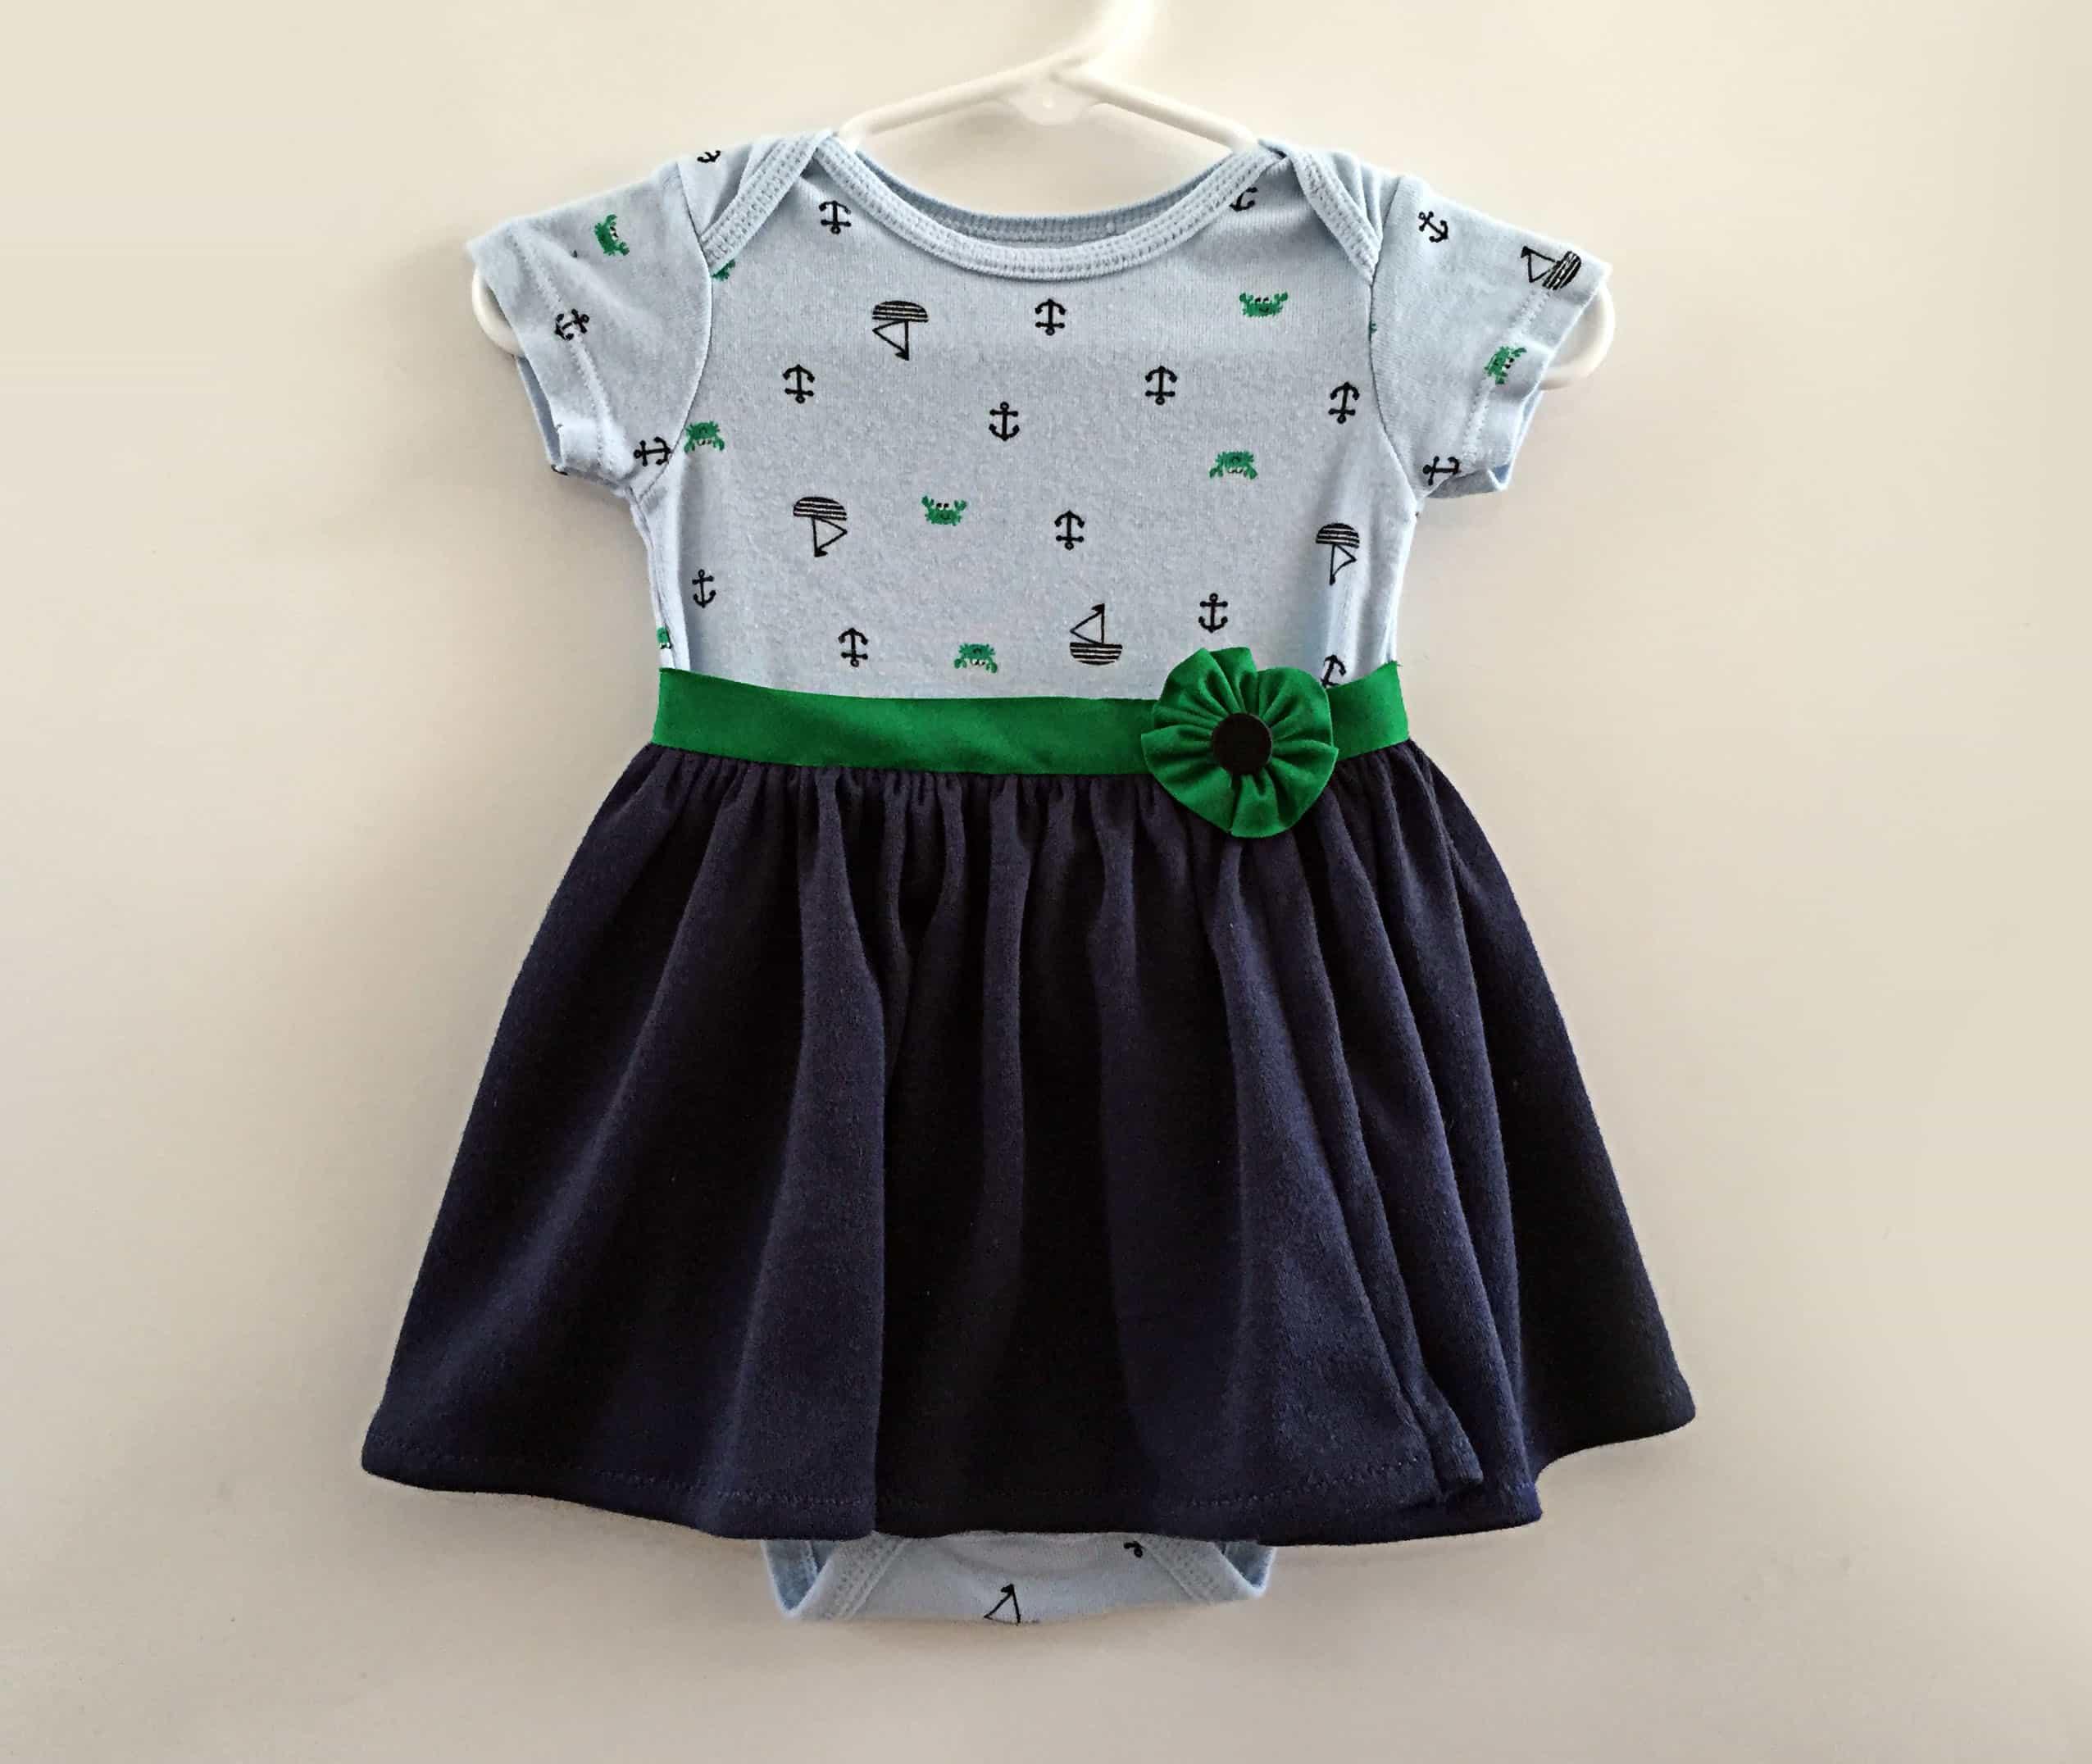 Wrap Skirt Onesie Tutorial - BugabooCity